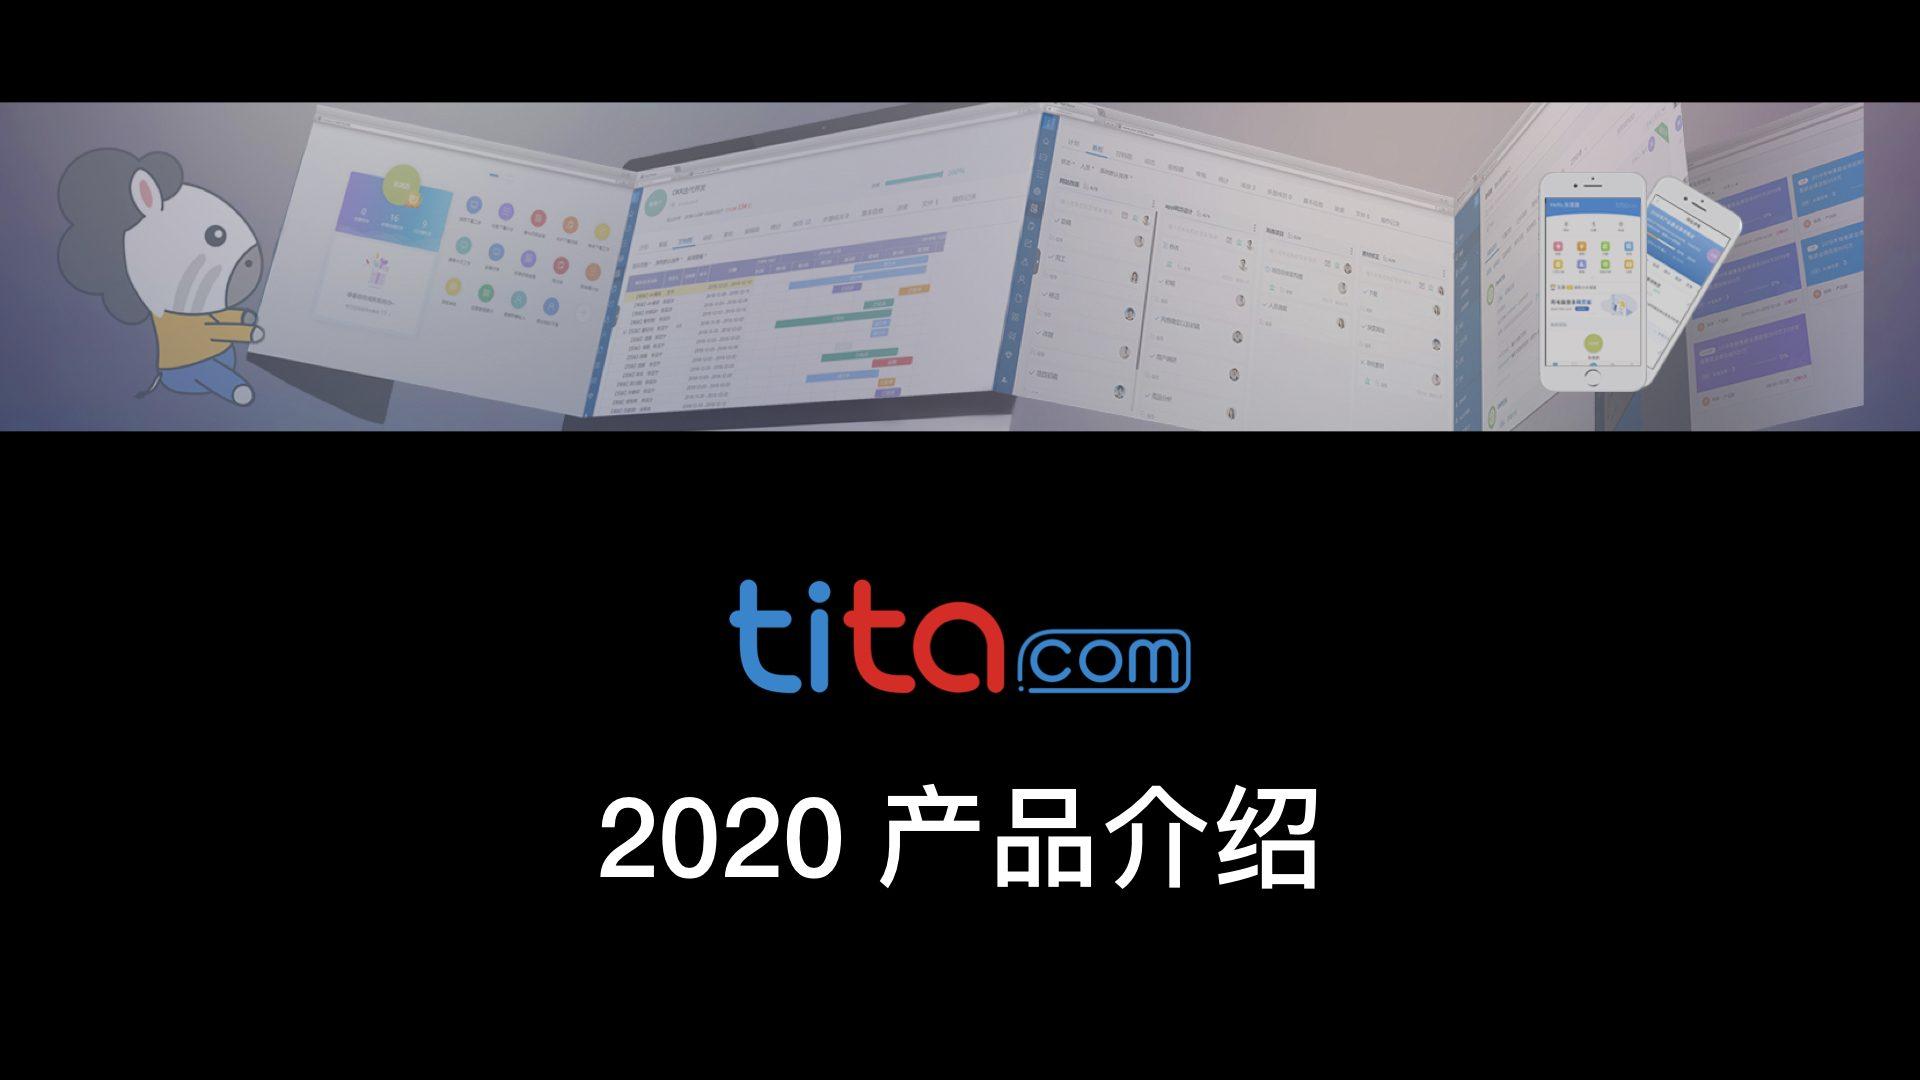 2020 产品介绍 | tita.com